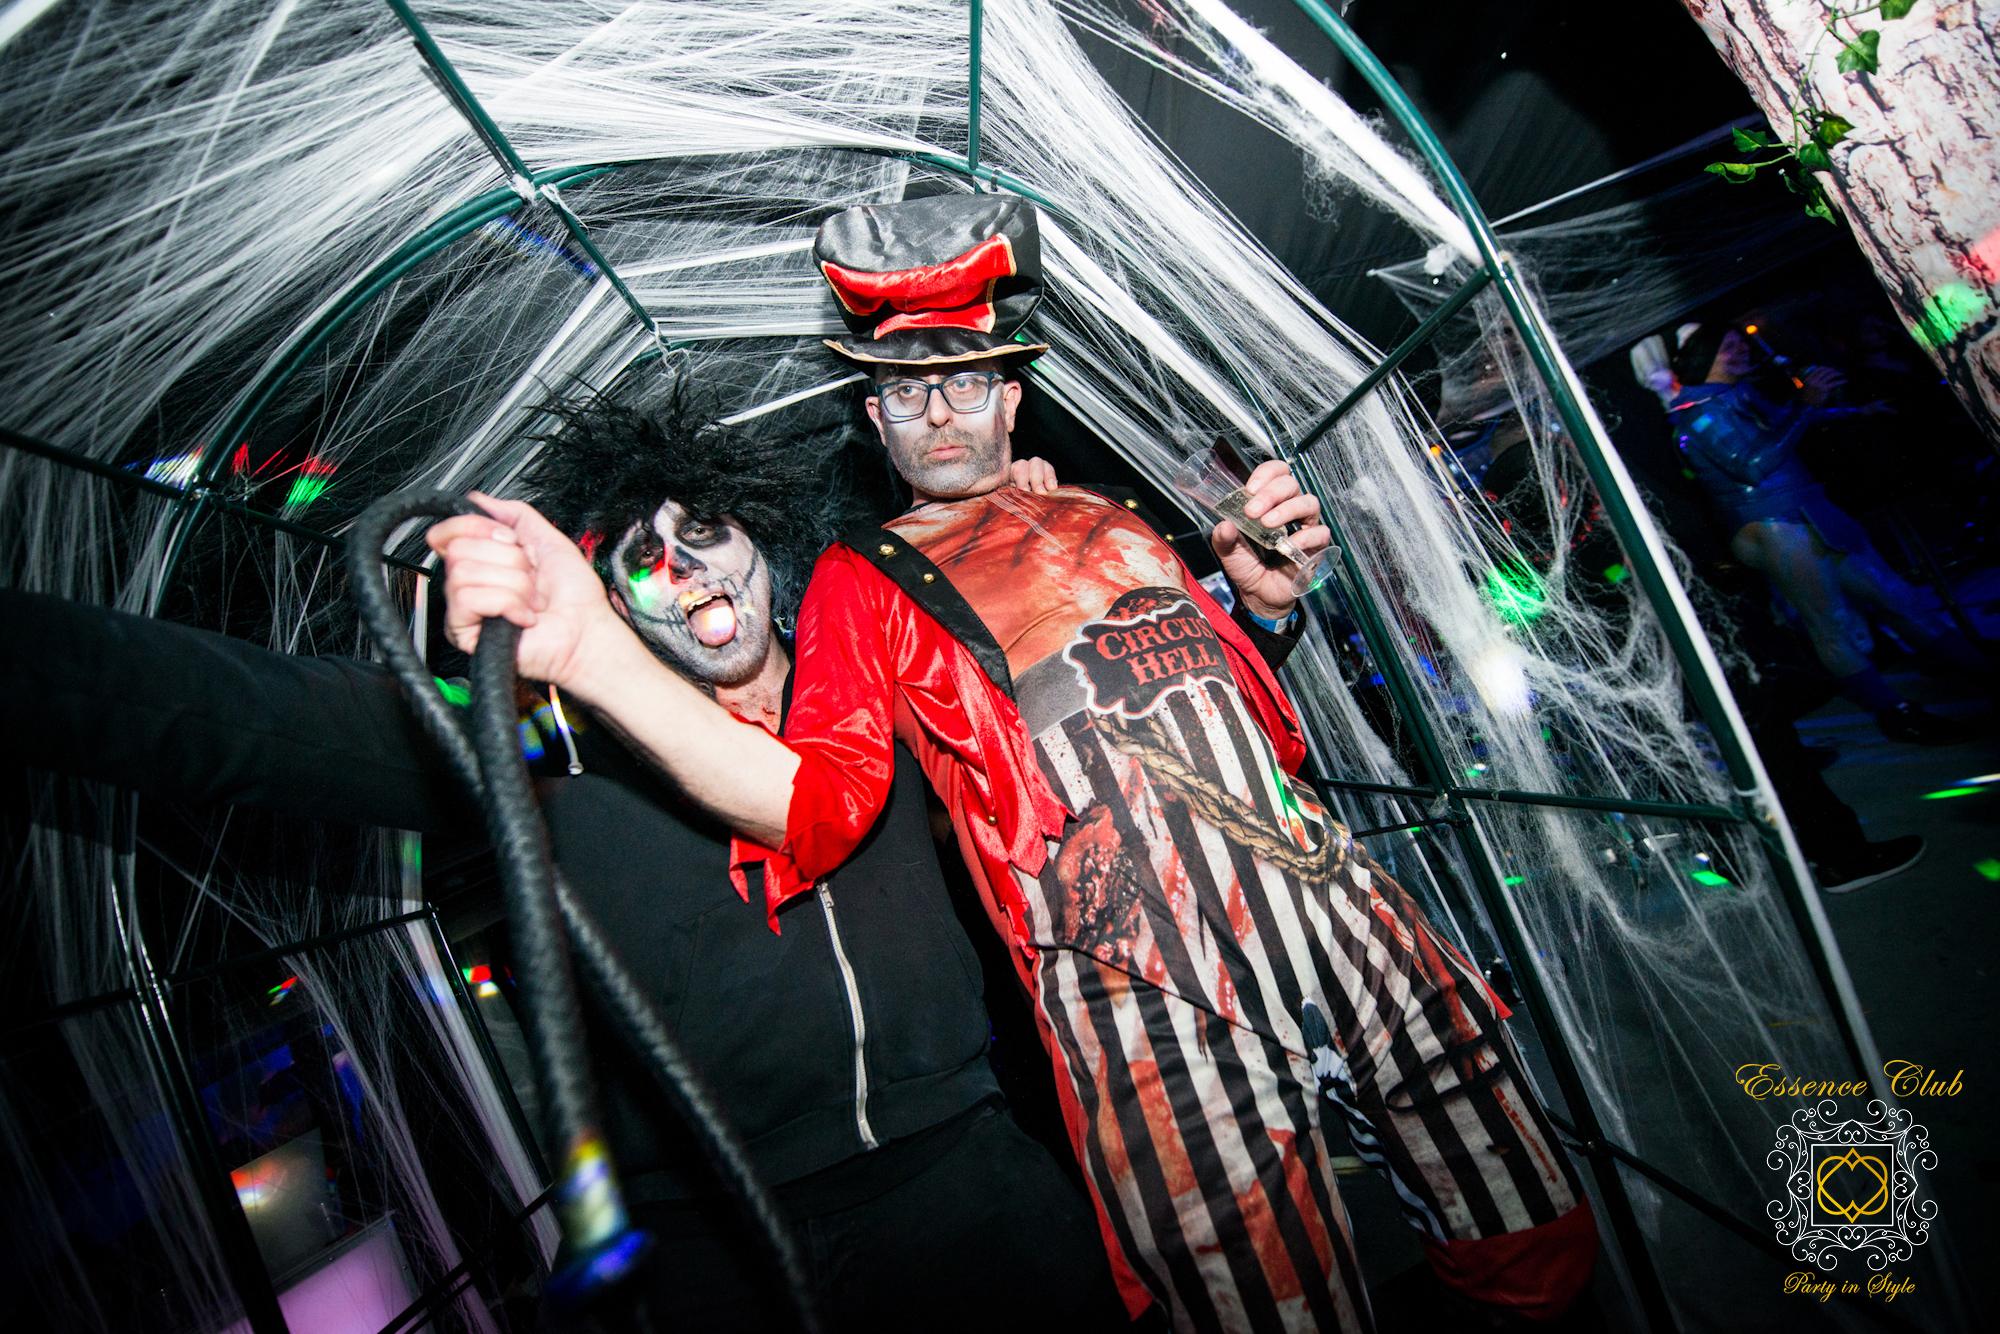 Essence Club Halloween Special